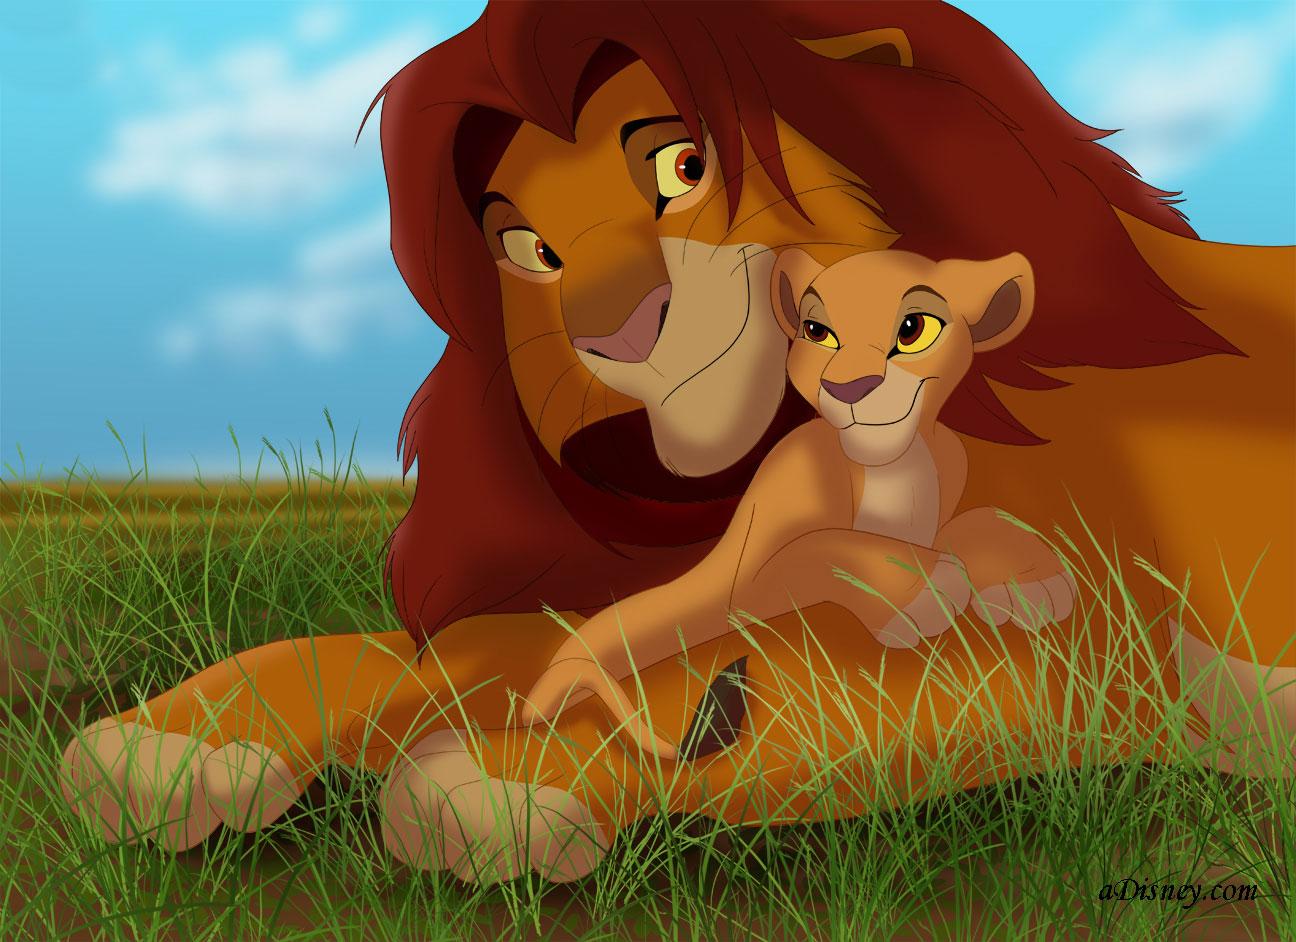 Simba and Kiara - The Lion King Photo (31141309) - Fanpop